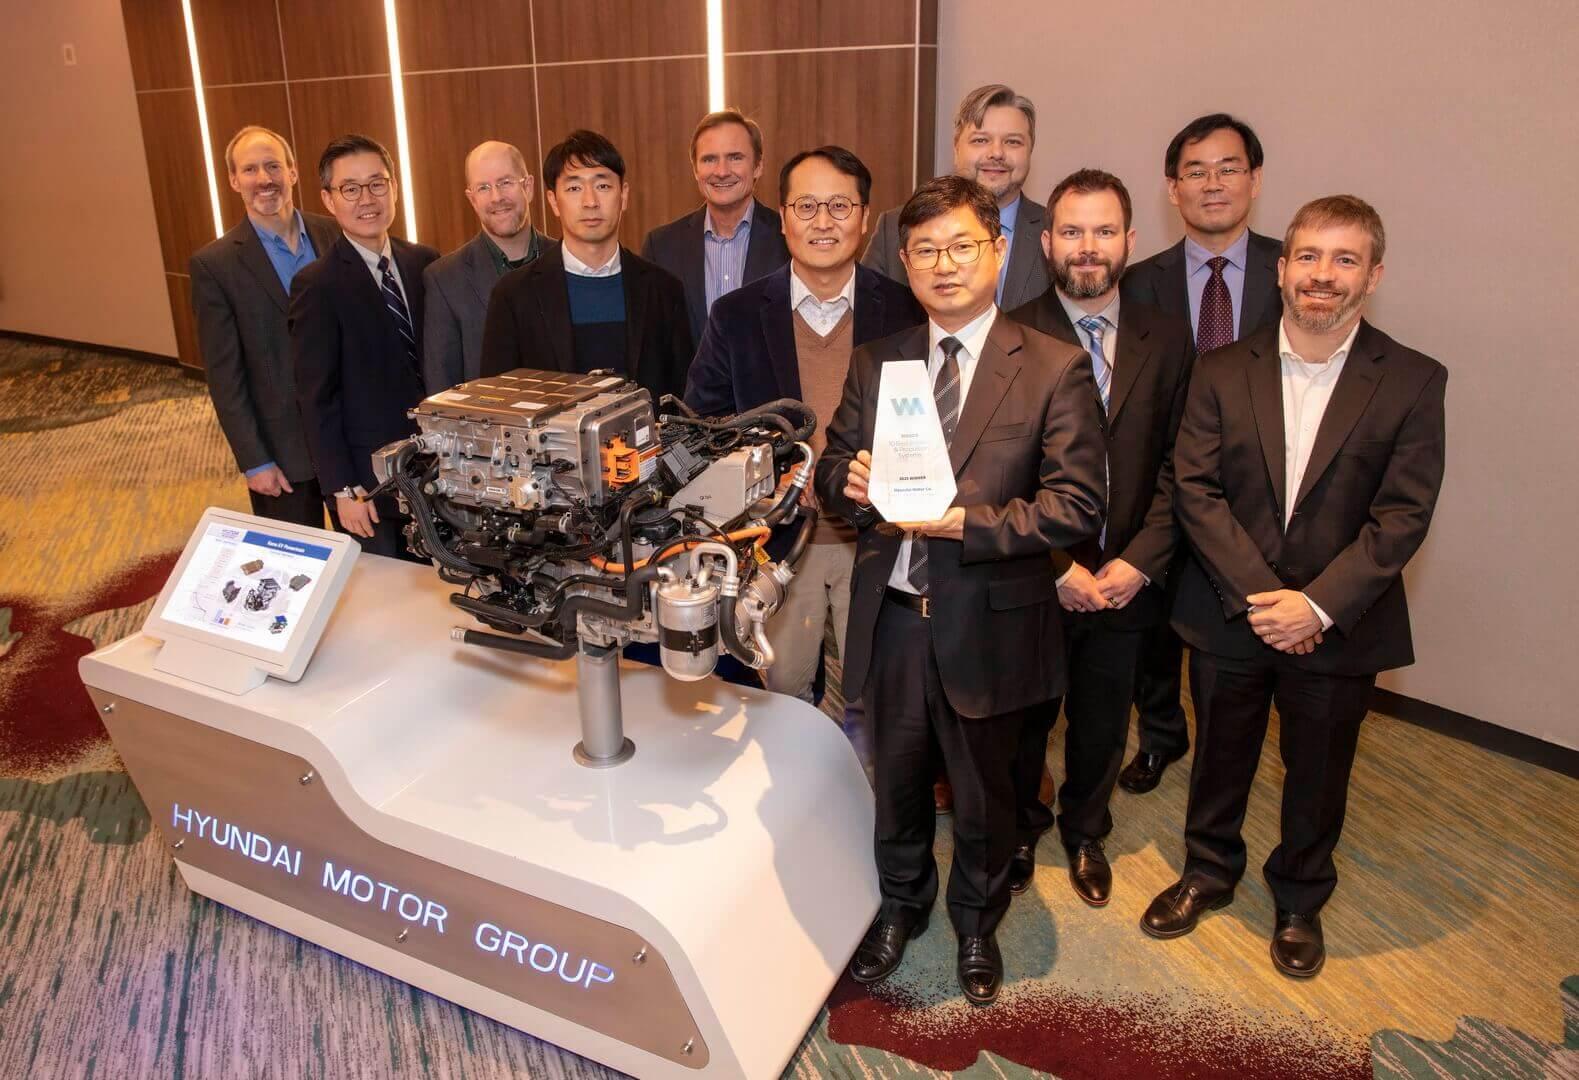 Електричний двигун Hyundai Kona Electric отримав нагороду рейтингу «Wards 10 Best Engines»